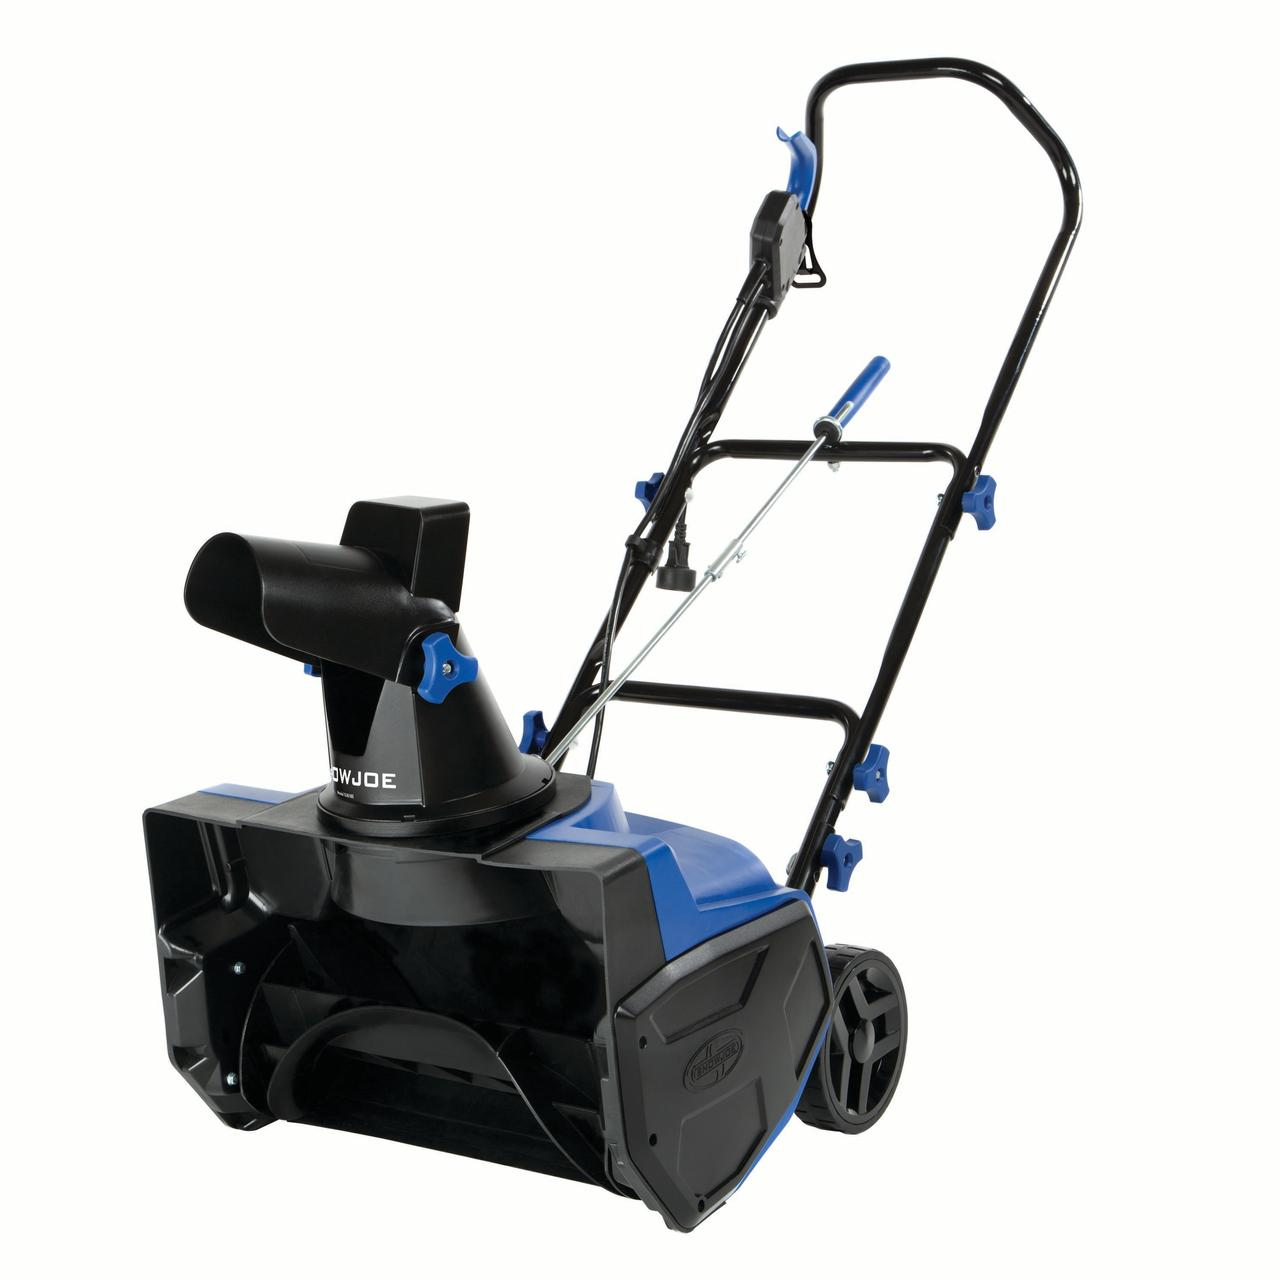 Snow Joe Ultra 18-Inch 13-Amp Electric Snow Blower - Refurbished